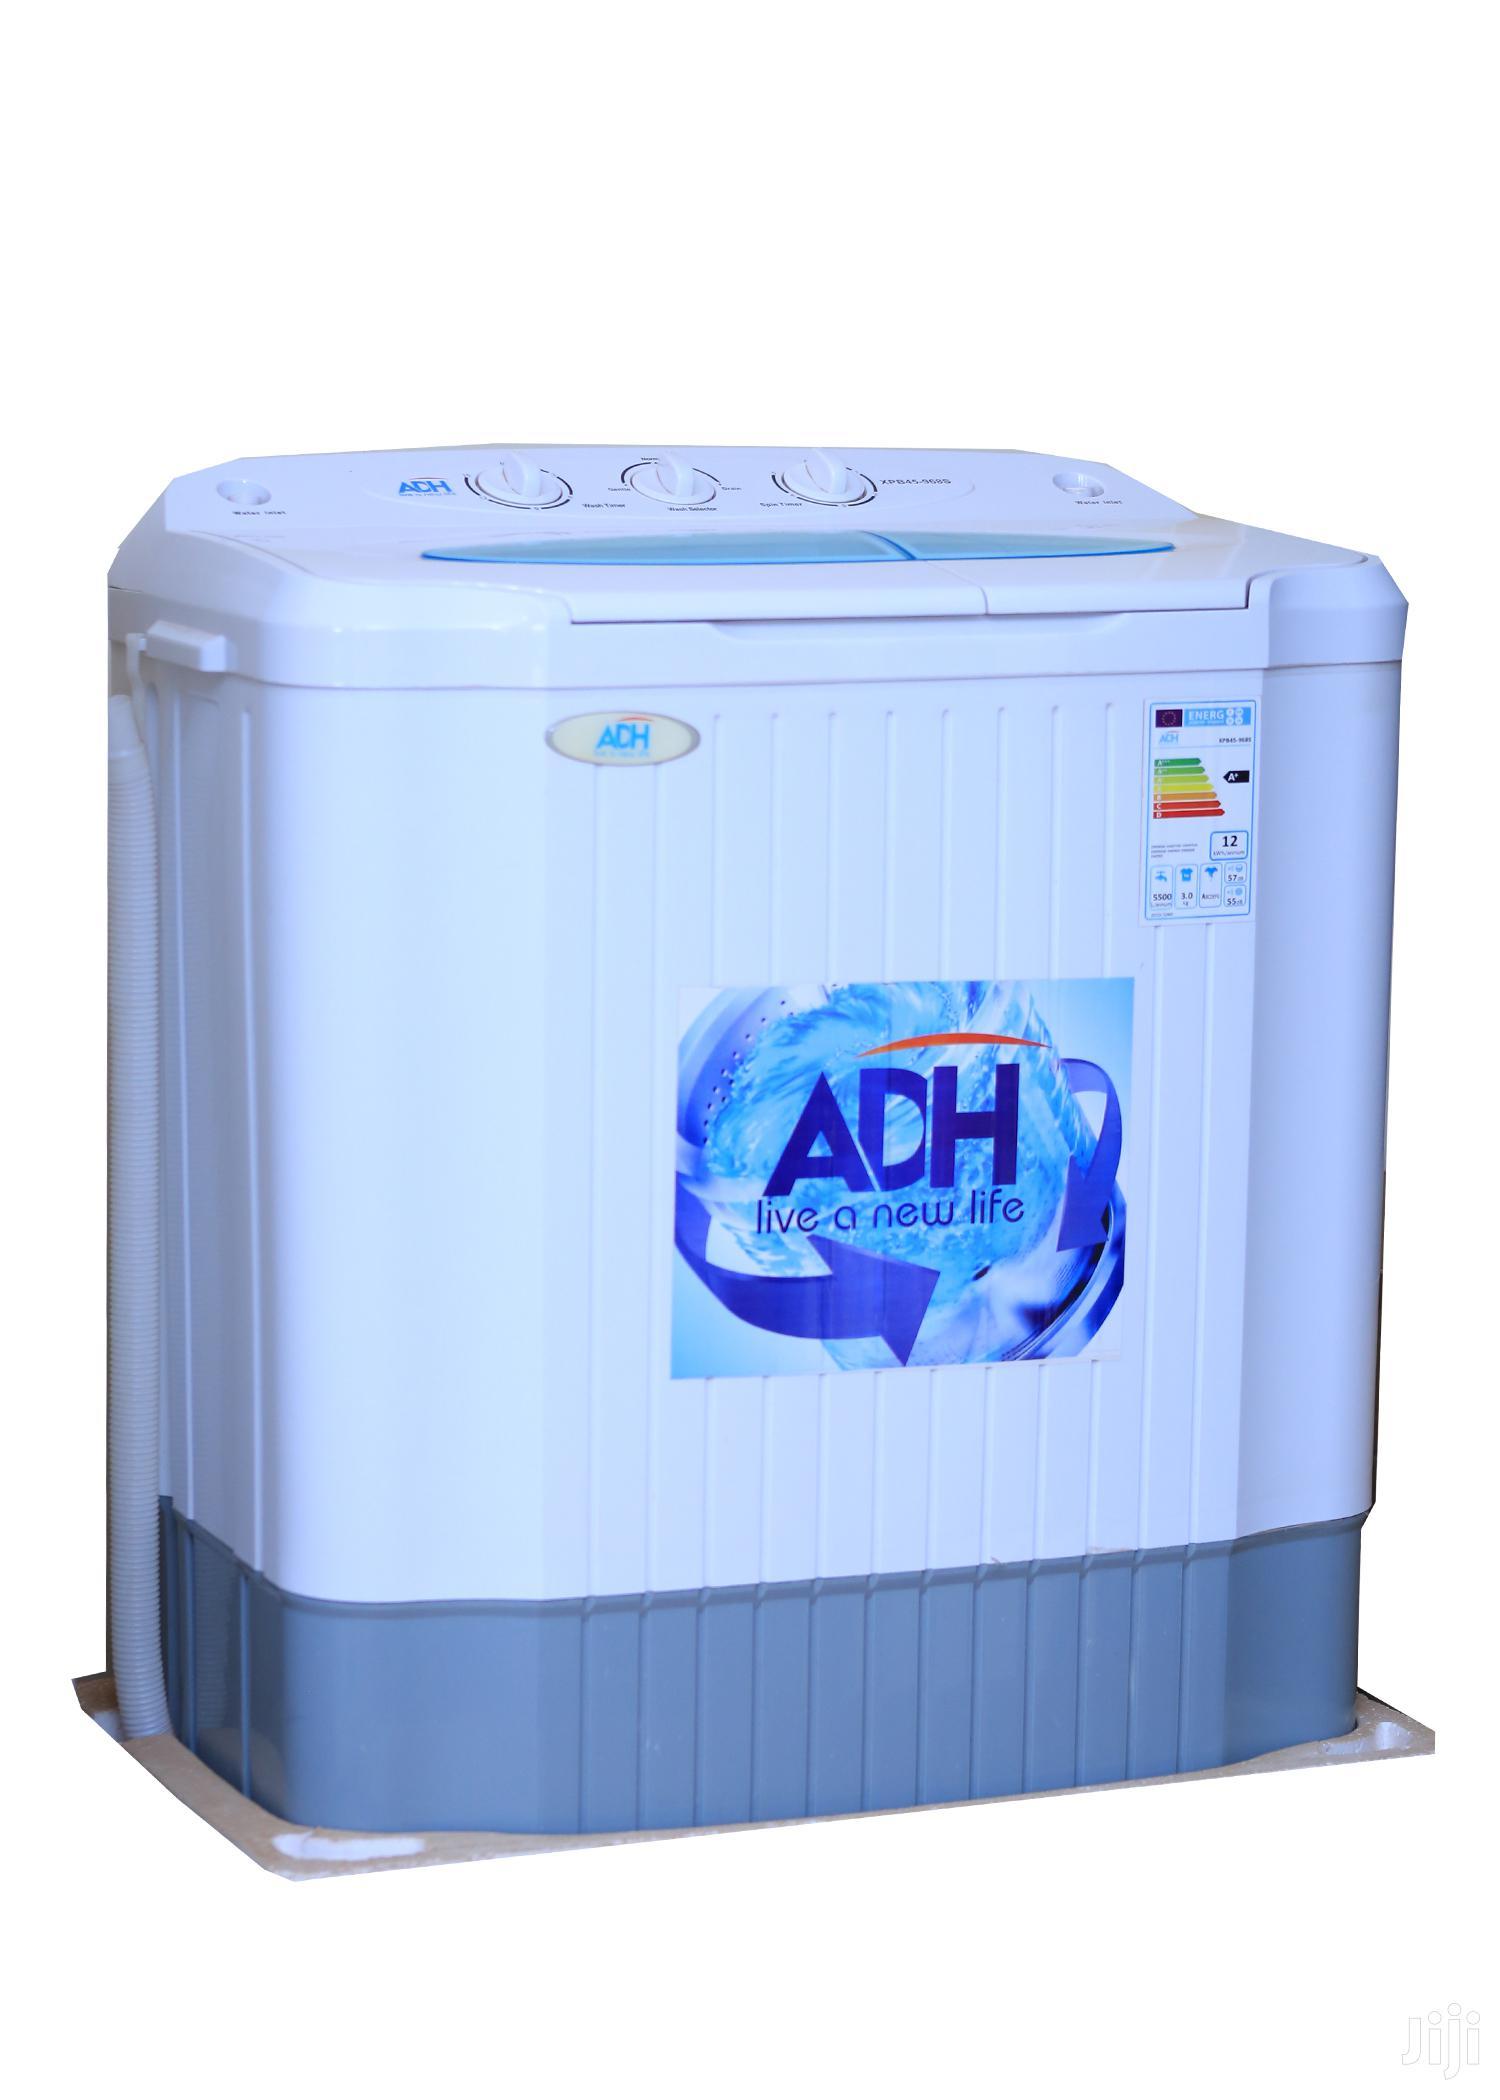 ADH Washing Machine 5kg